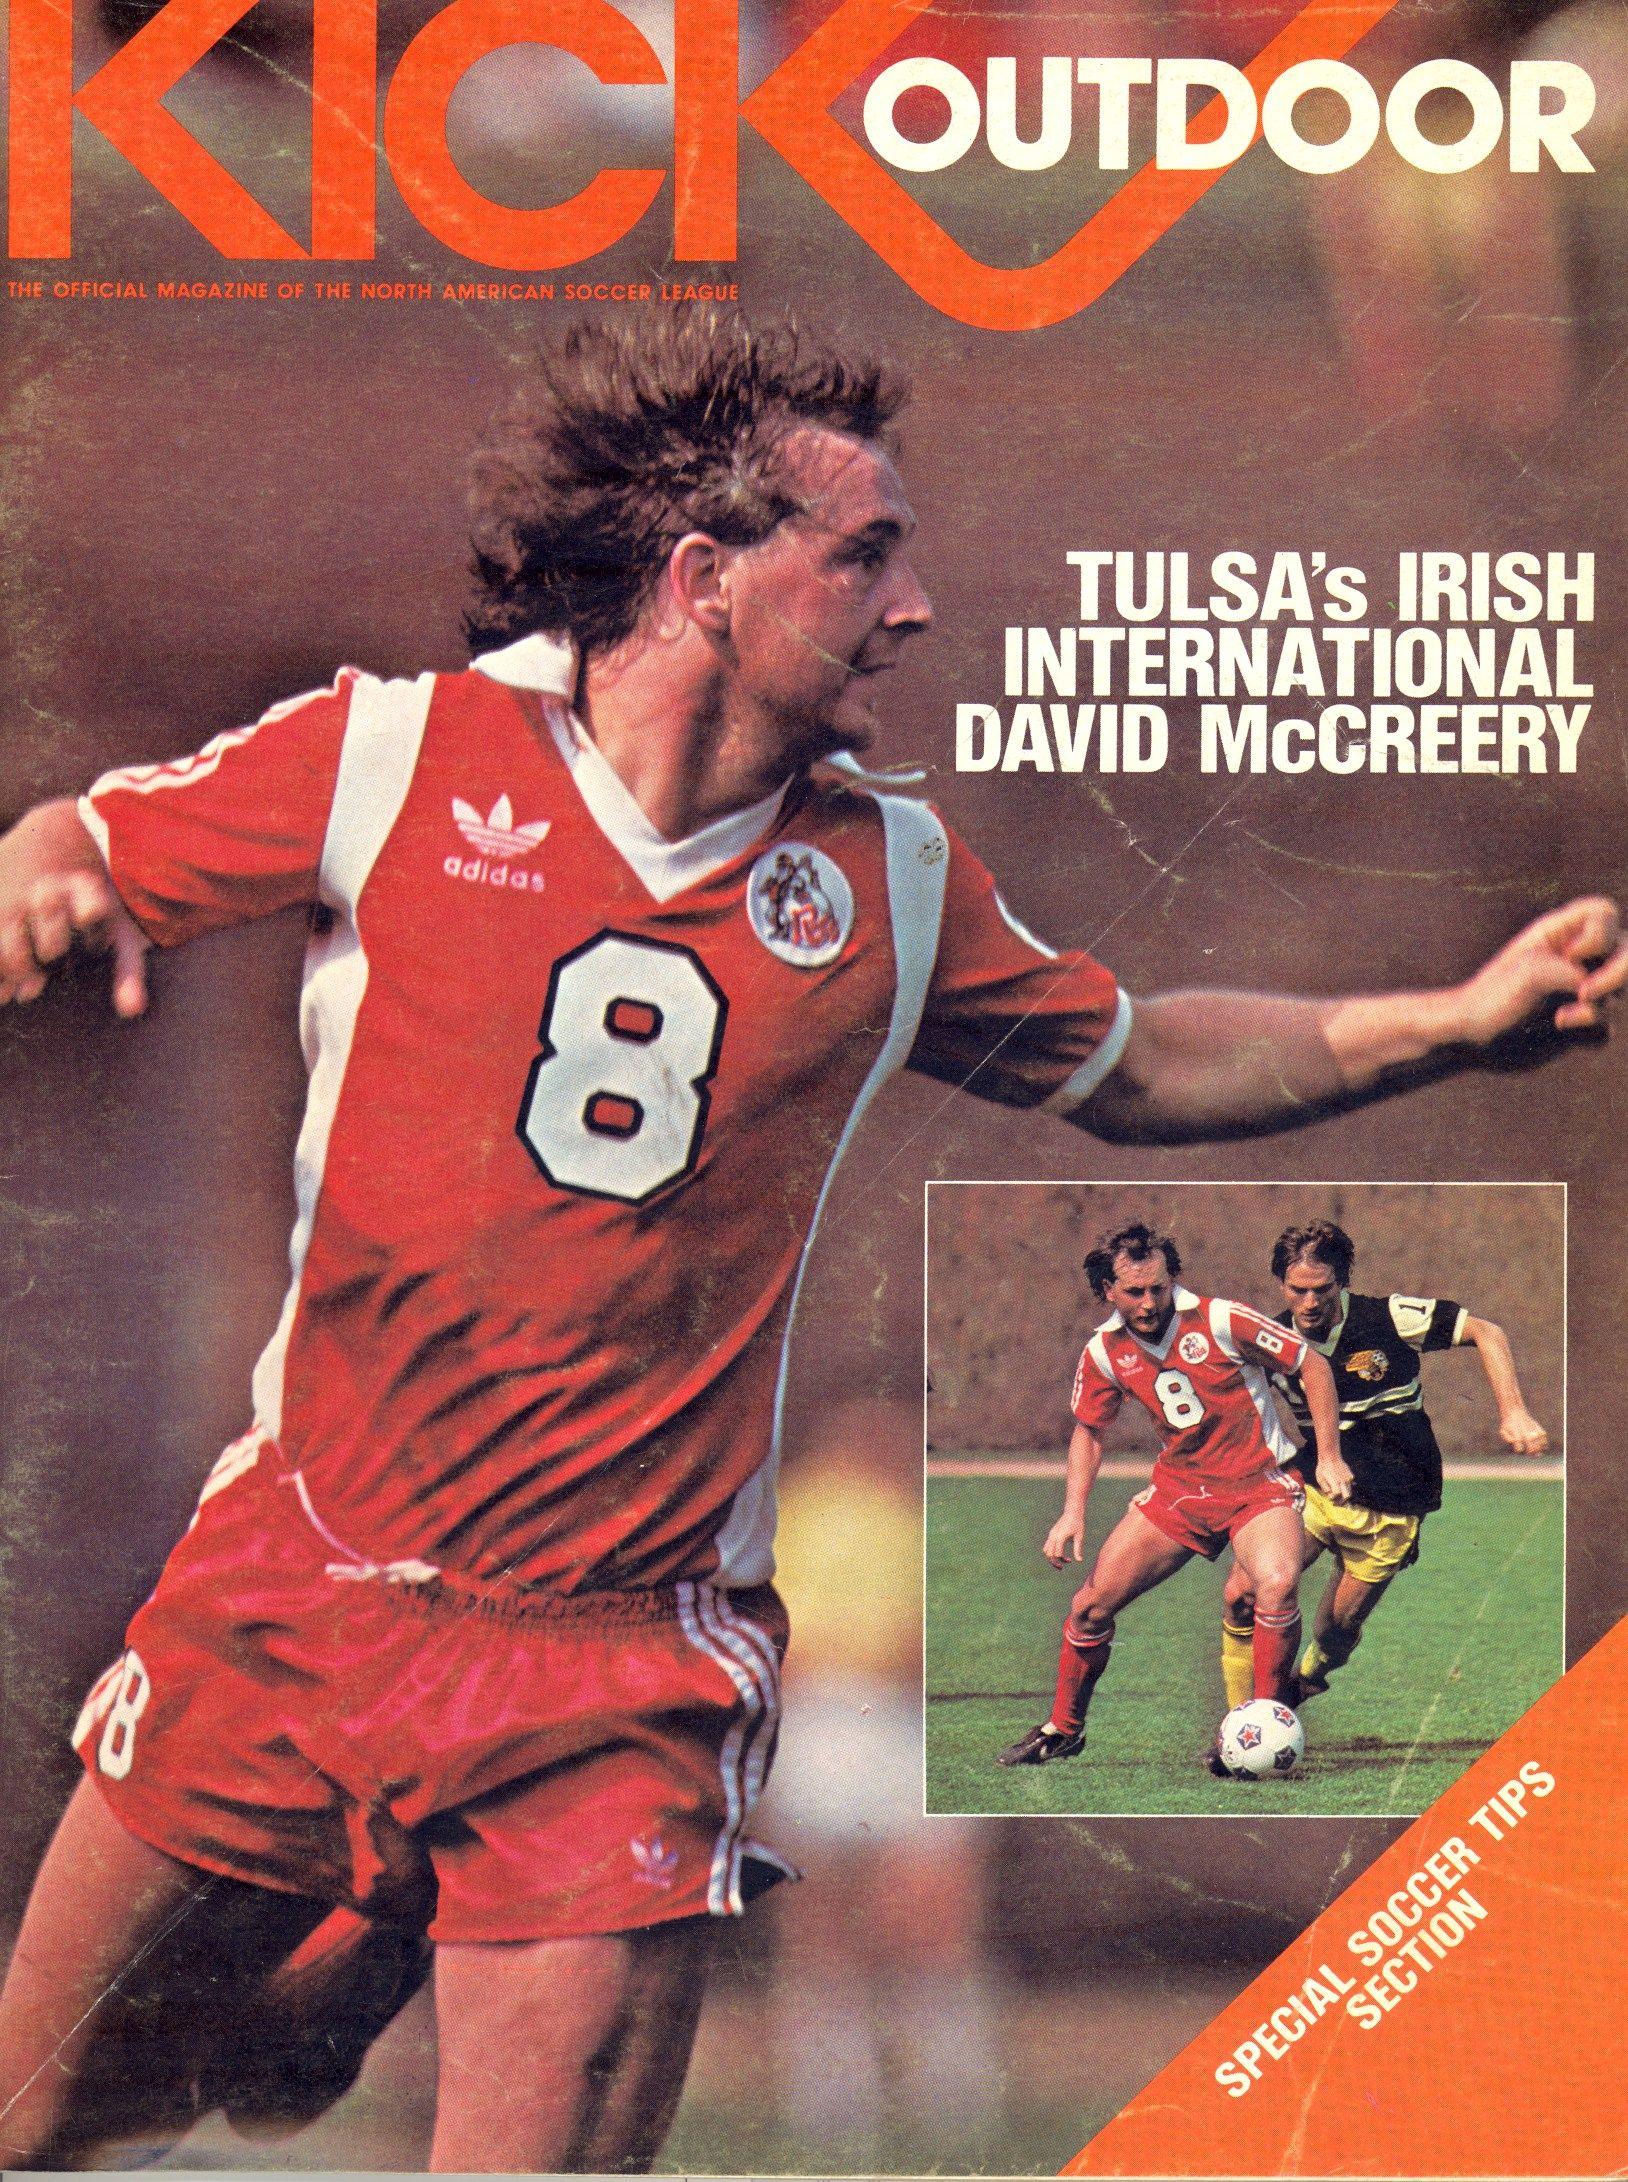 1982 Kick Magazine Whitecaps Vs San Jose Earthquakes In 2020 North American Soccer League American League San Jose Earthquakes